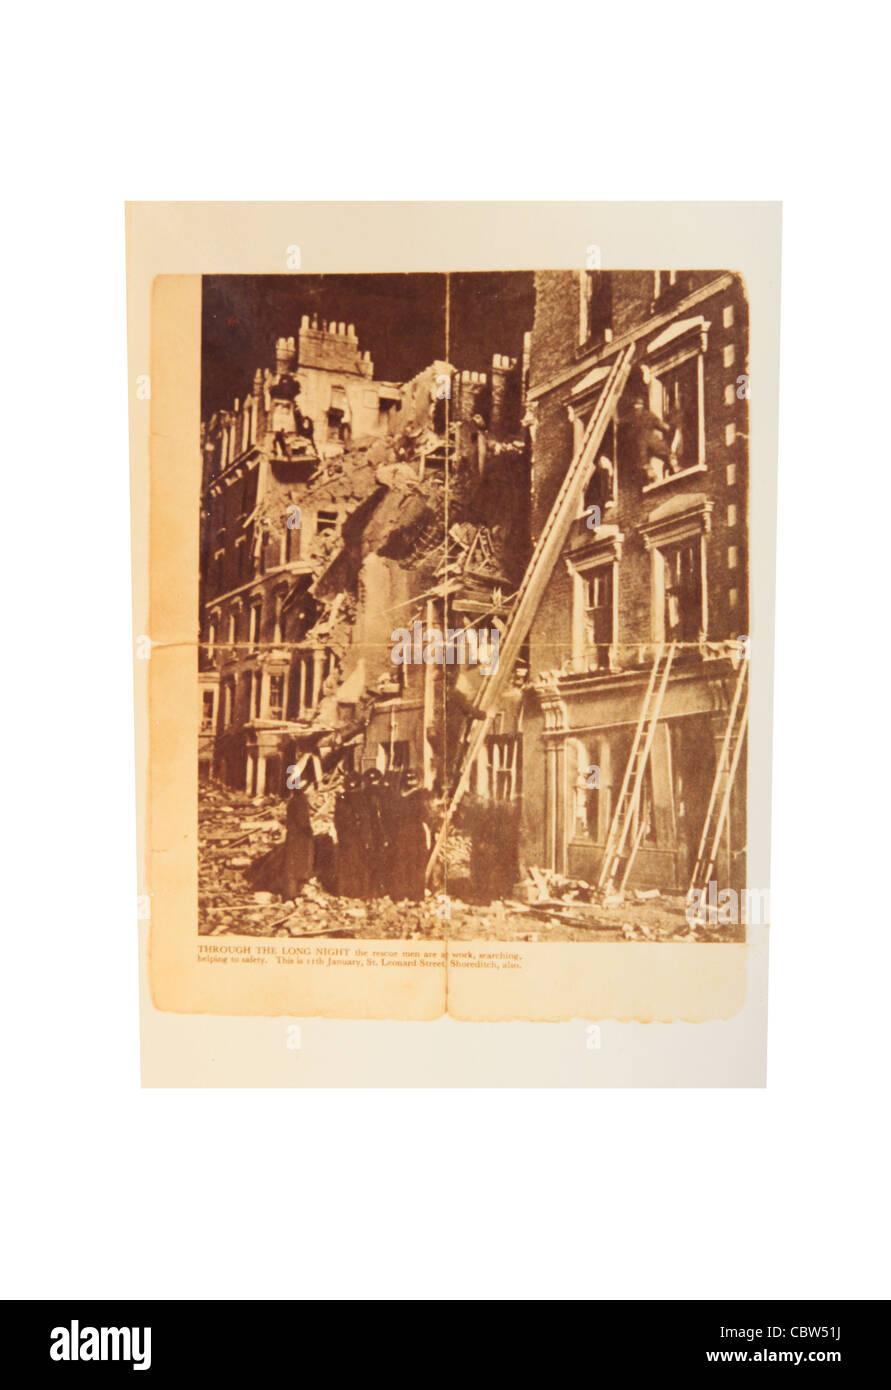 Leonard Street, EC2 bombed buildings during World War 2. - Stock Image